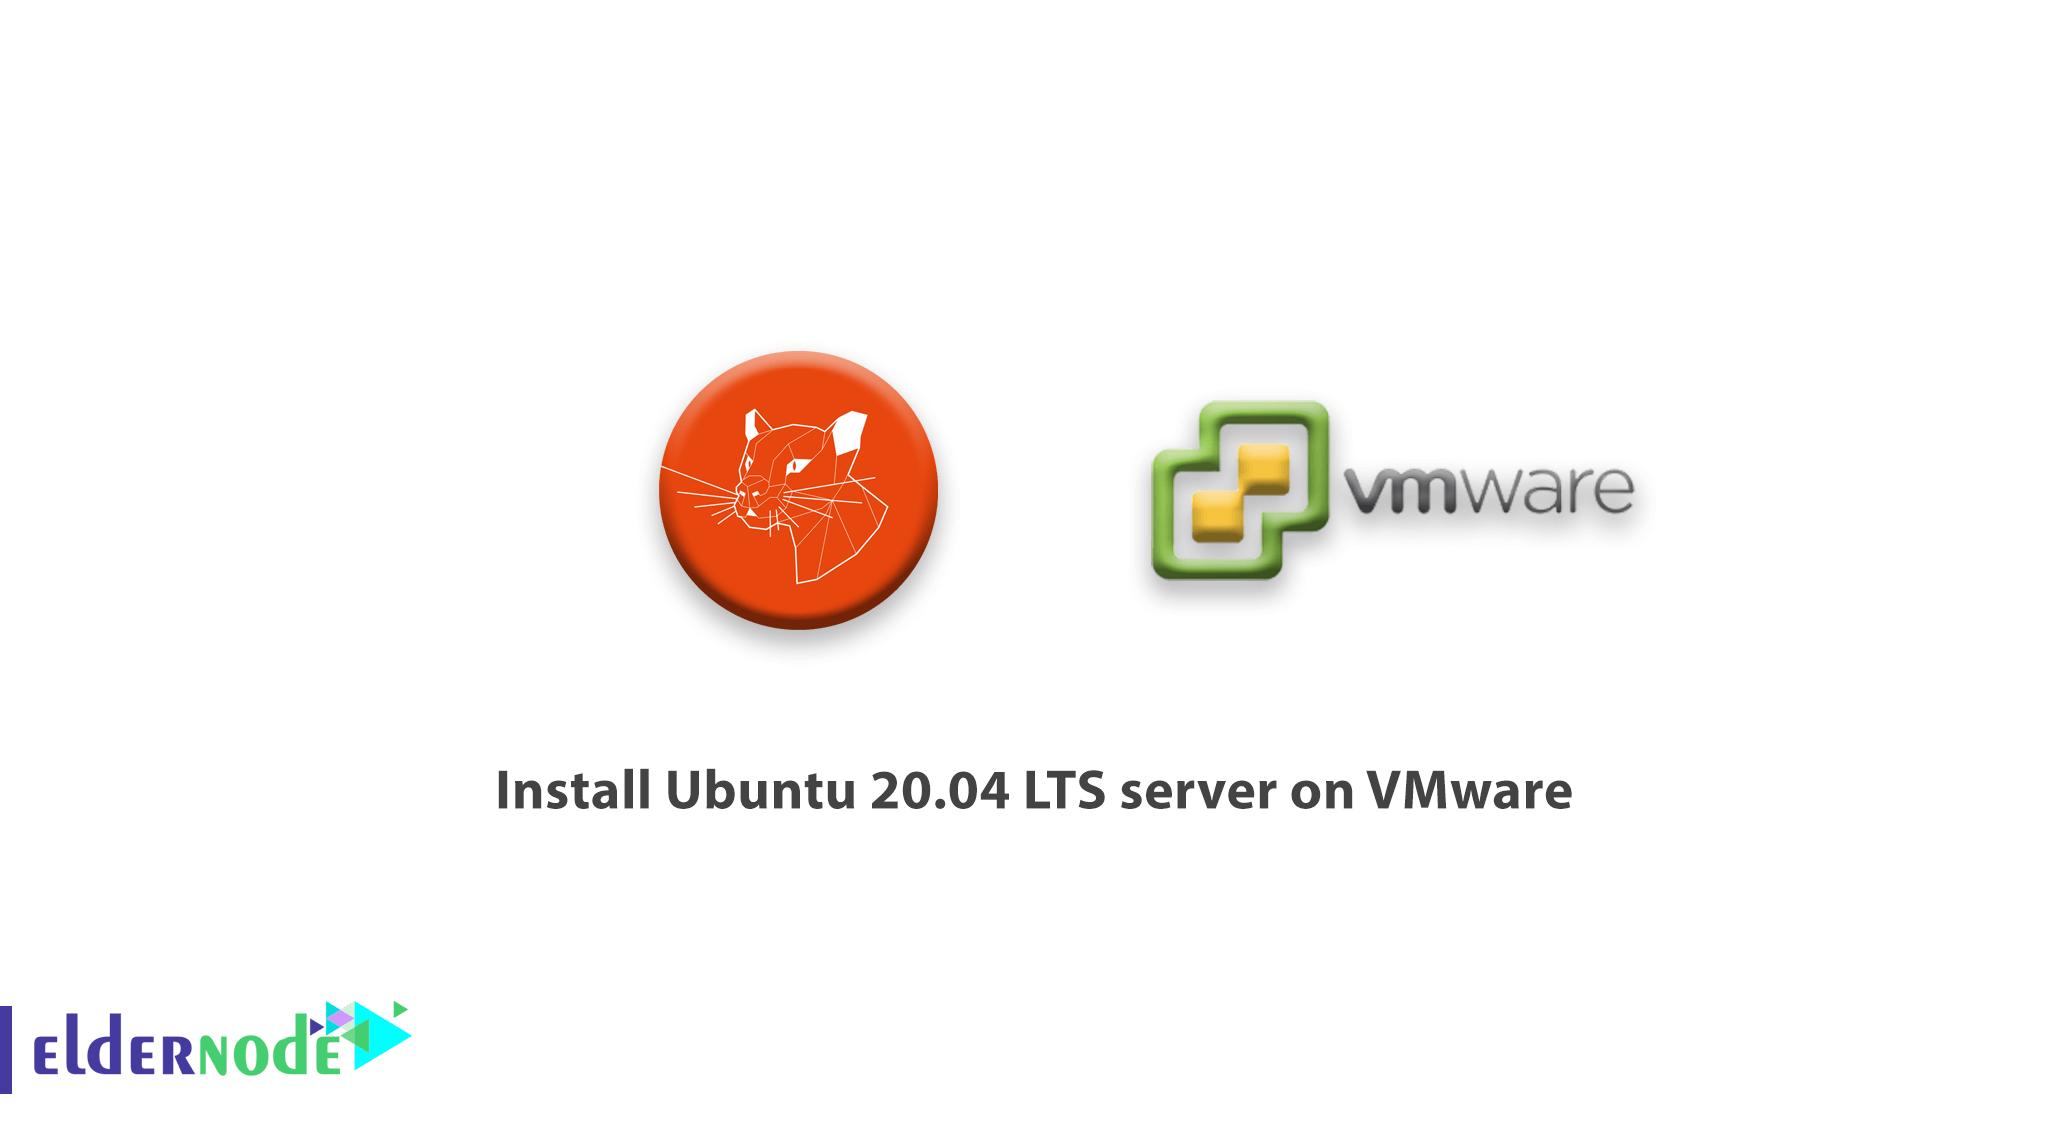 Install Ubuntu 20.04 LTS server on VMware